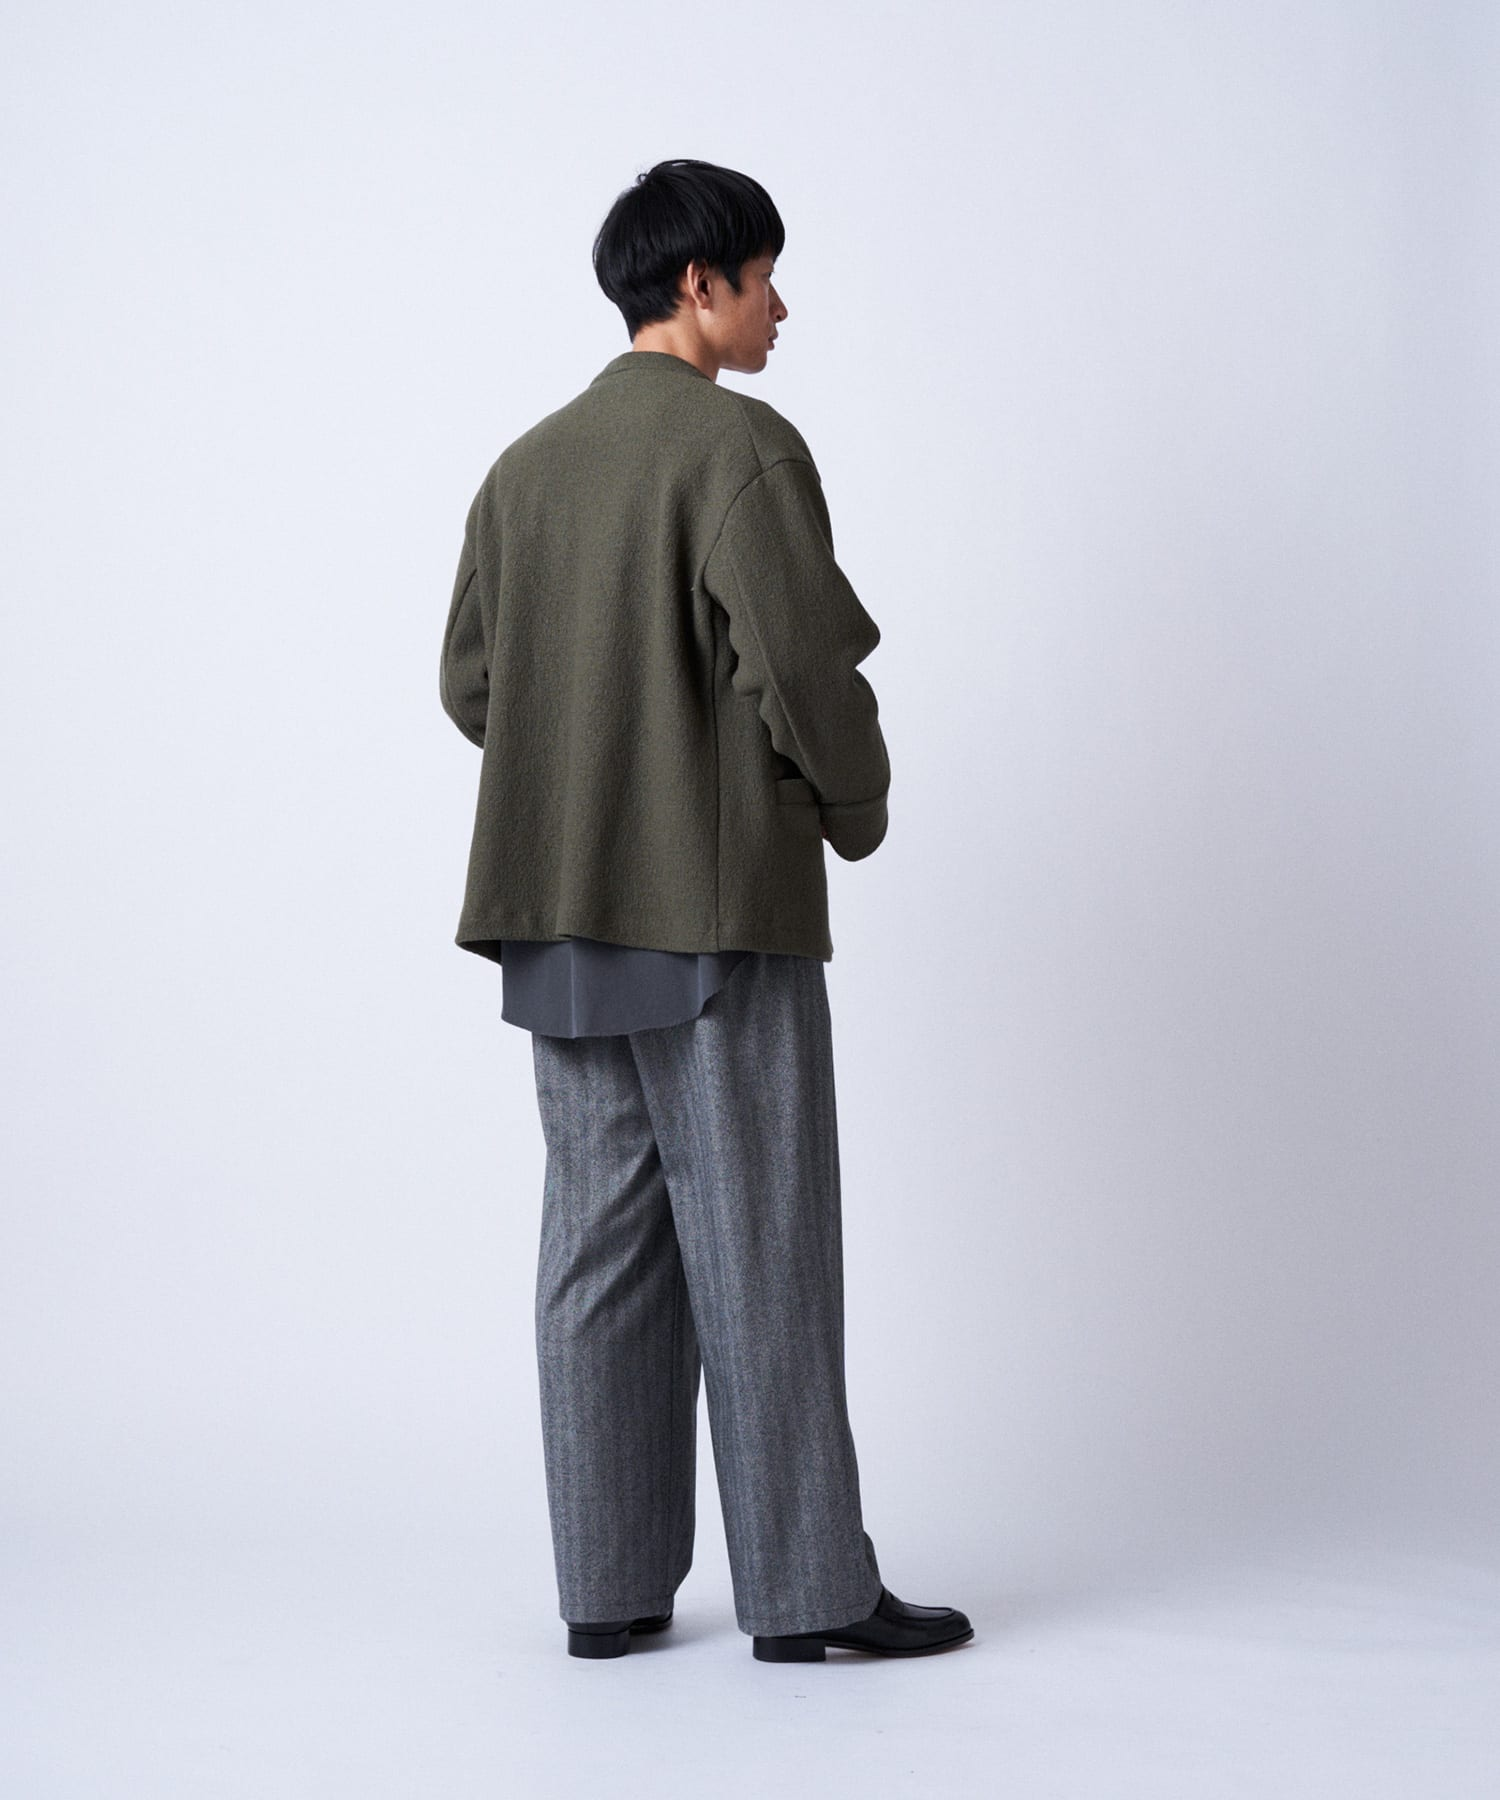 BLOOM&BRANCH(ブルームアンドブランチ) Phlannèl / mens Wool Gurkha Trousers